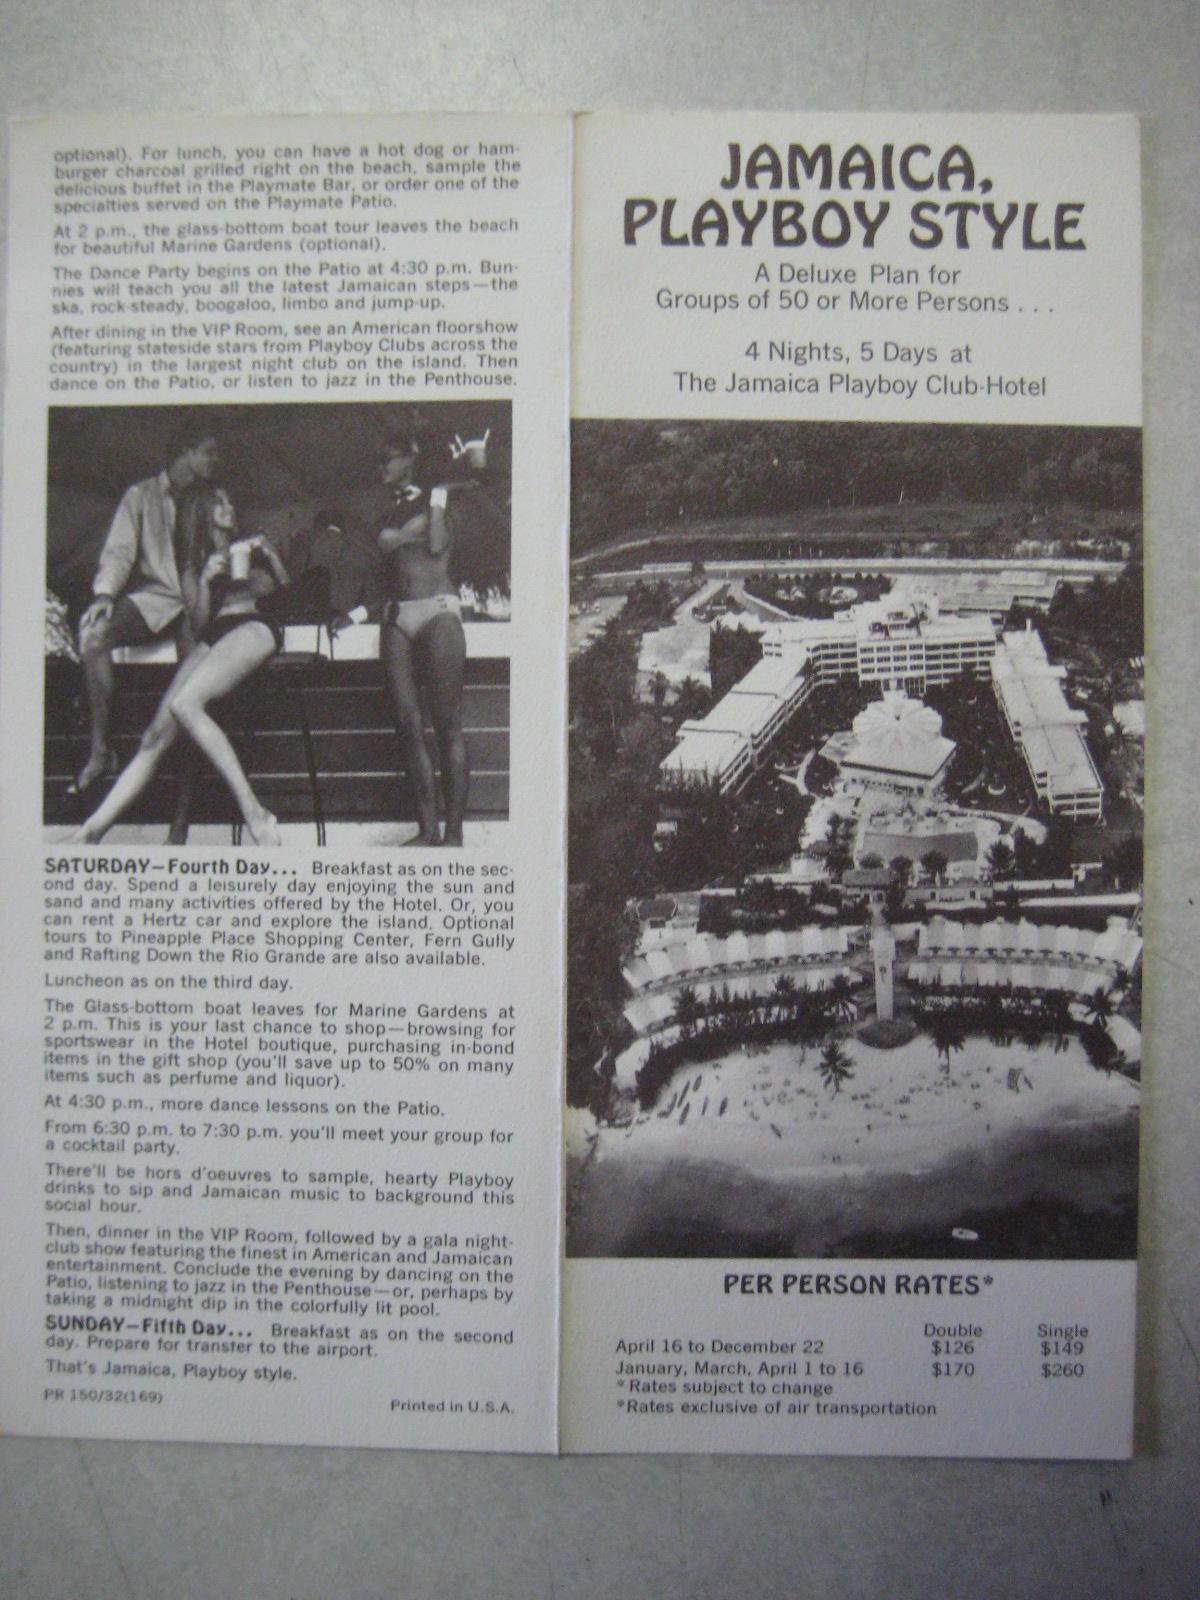 Playboy Club Hotel Jamaica Rates